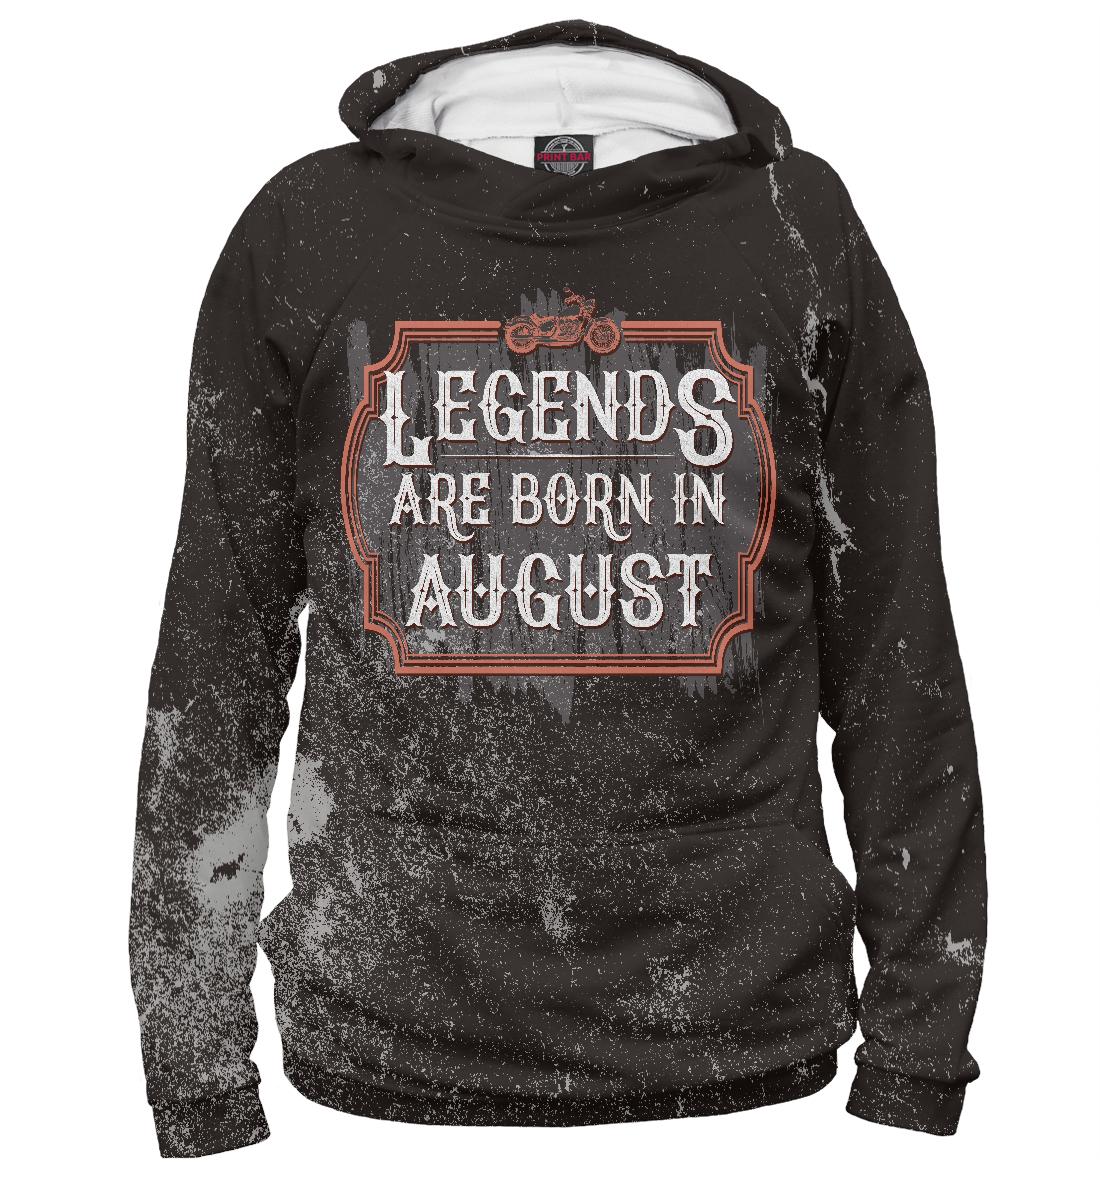 Купить Legends Are Born In August, Printbar, Худи, AUG-868672-hud-1